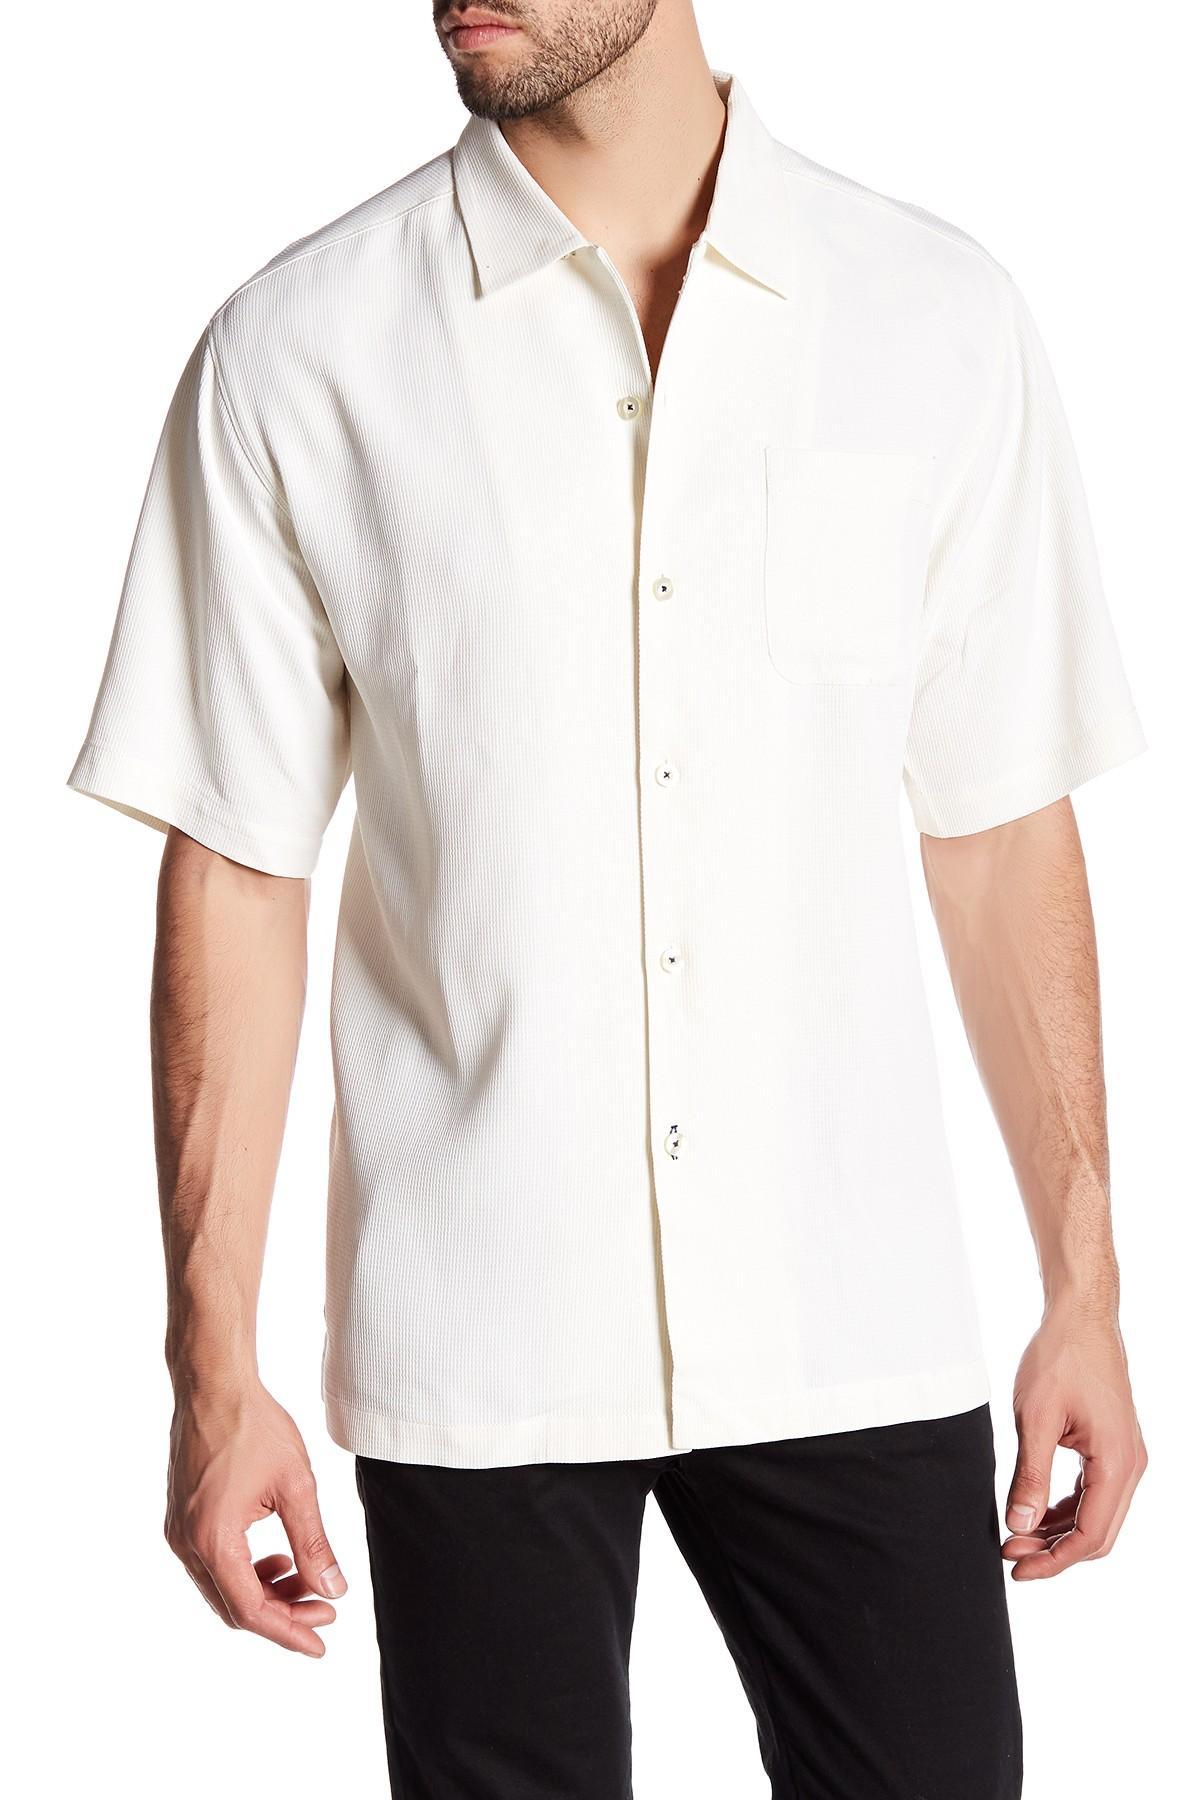 Bugatchi Men S Shirts